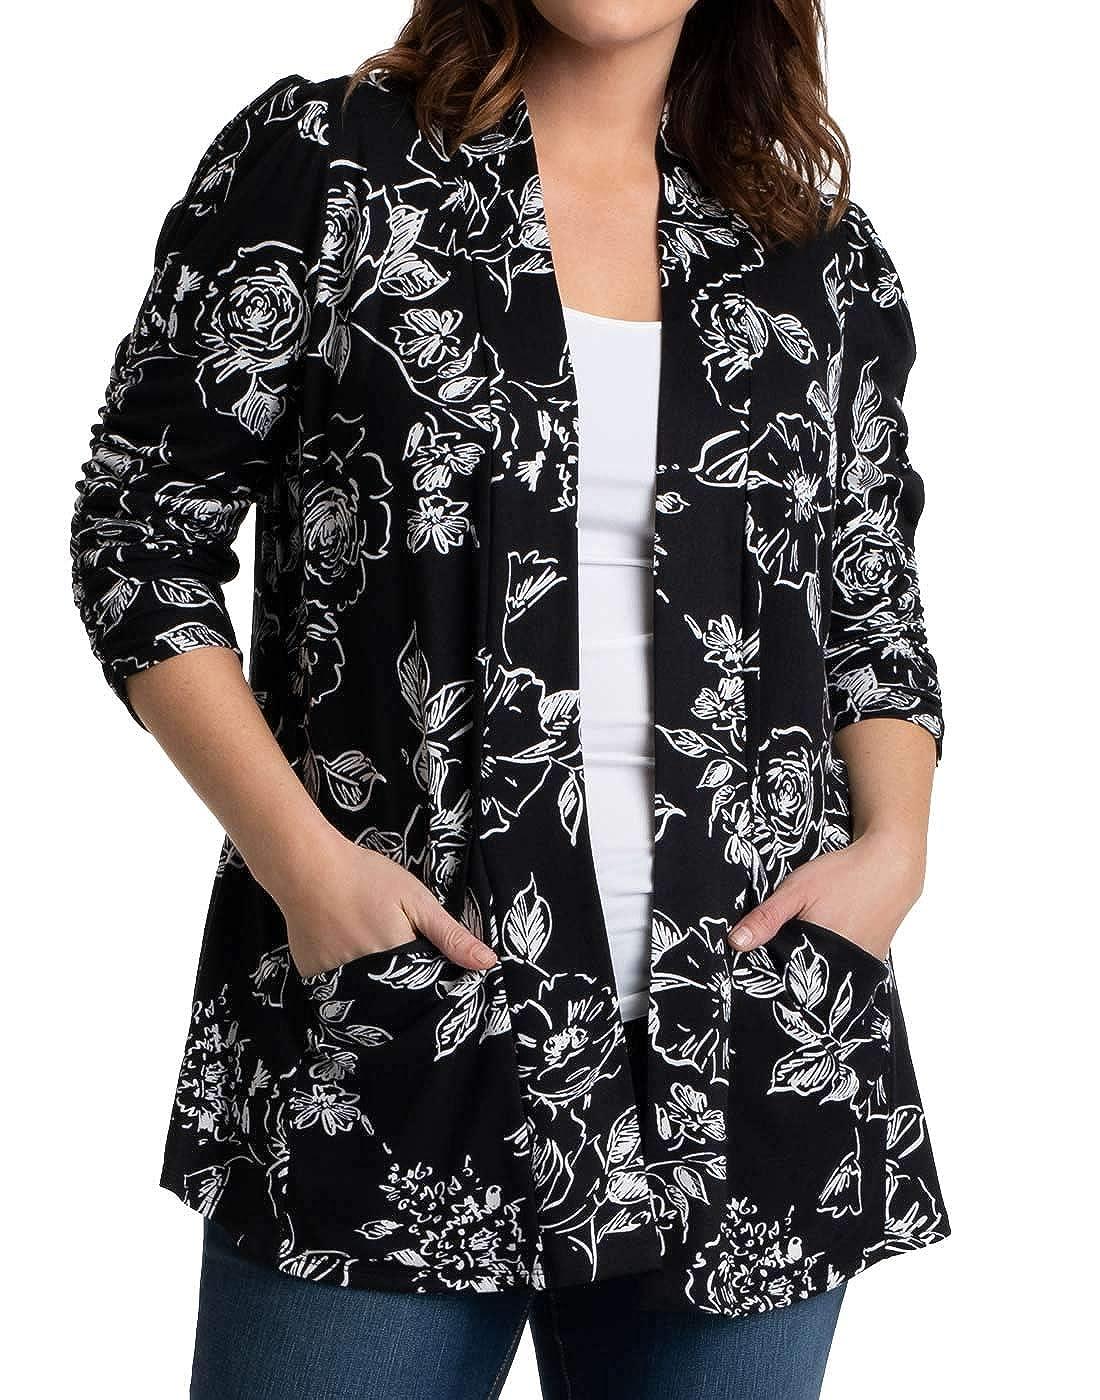 Kiyonna Womens Plus Size Aubrey Bellini Black Rose Noir